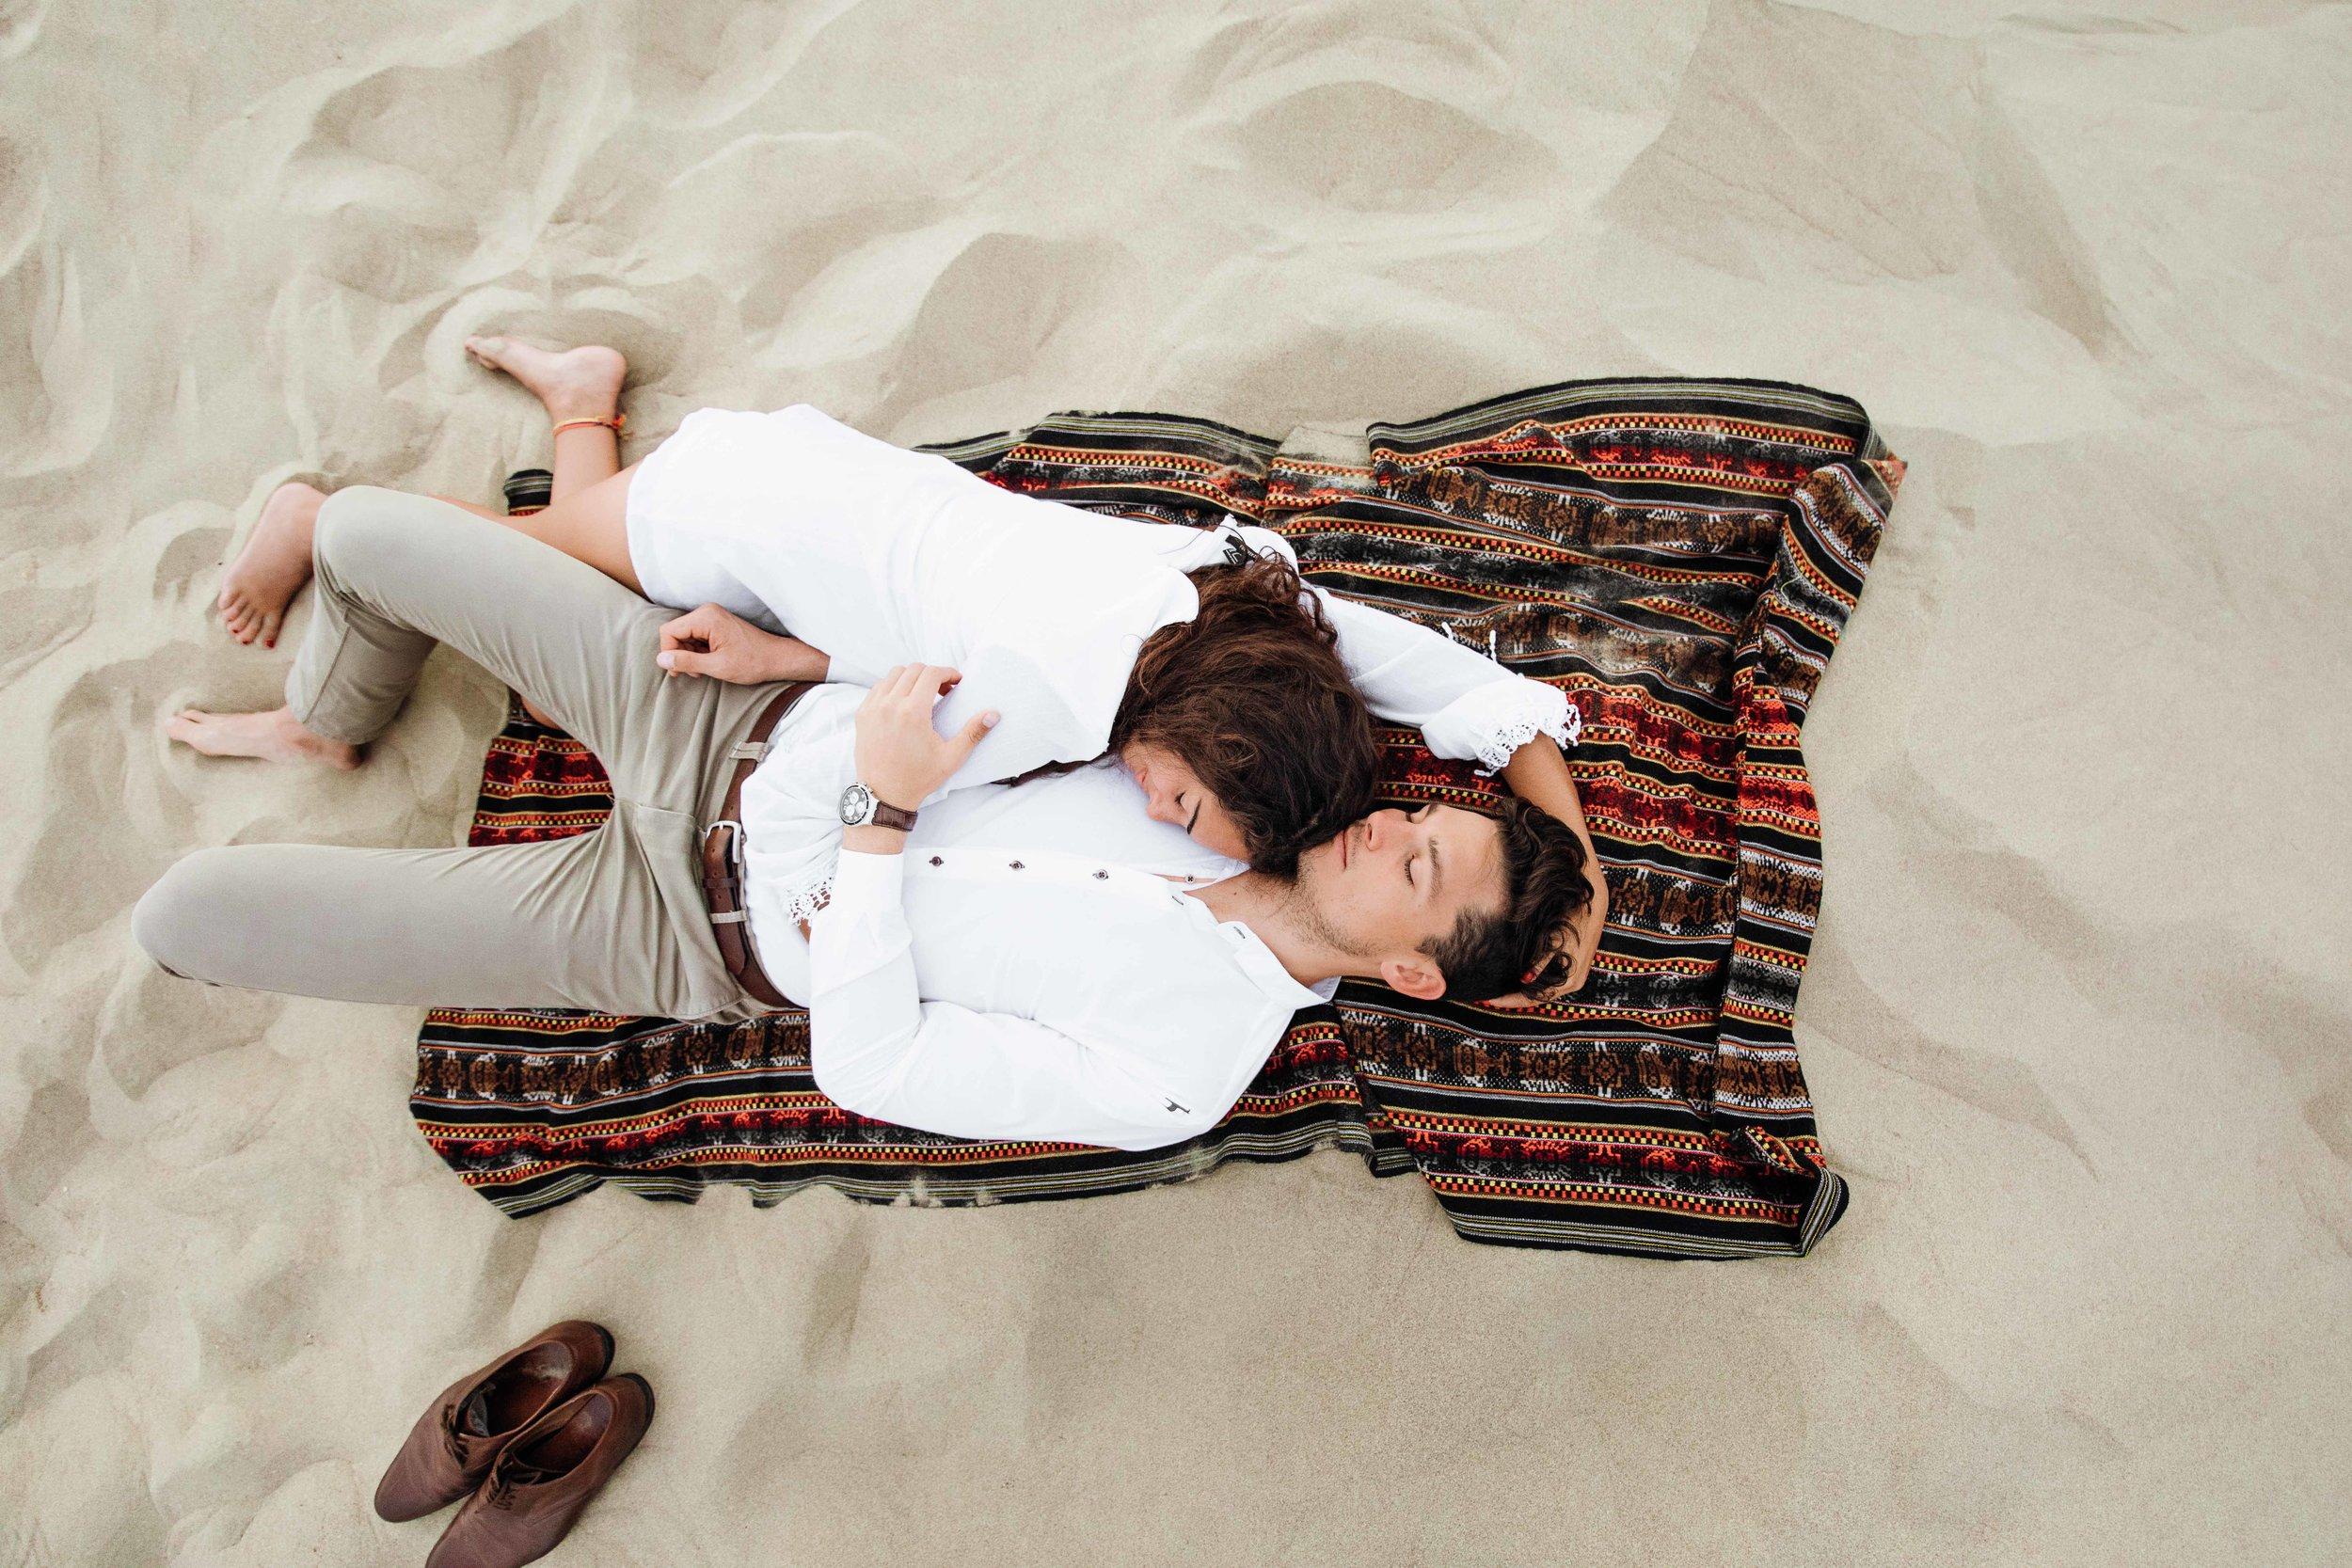 huacachina-peru-honeymoon-elopement-destination-wedding-photography-michael-cozzens-21.jpg